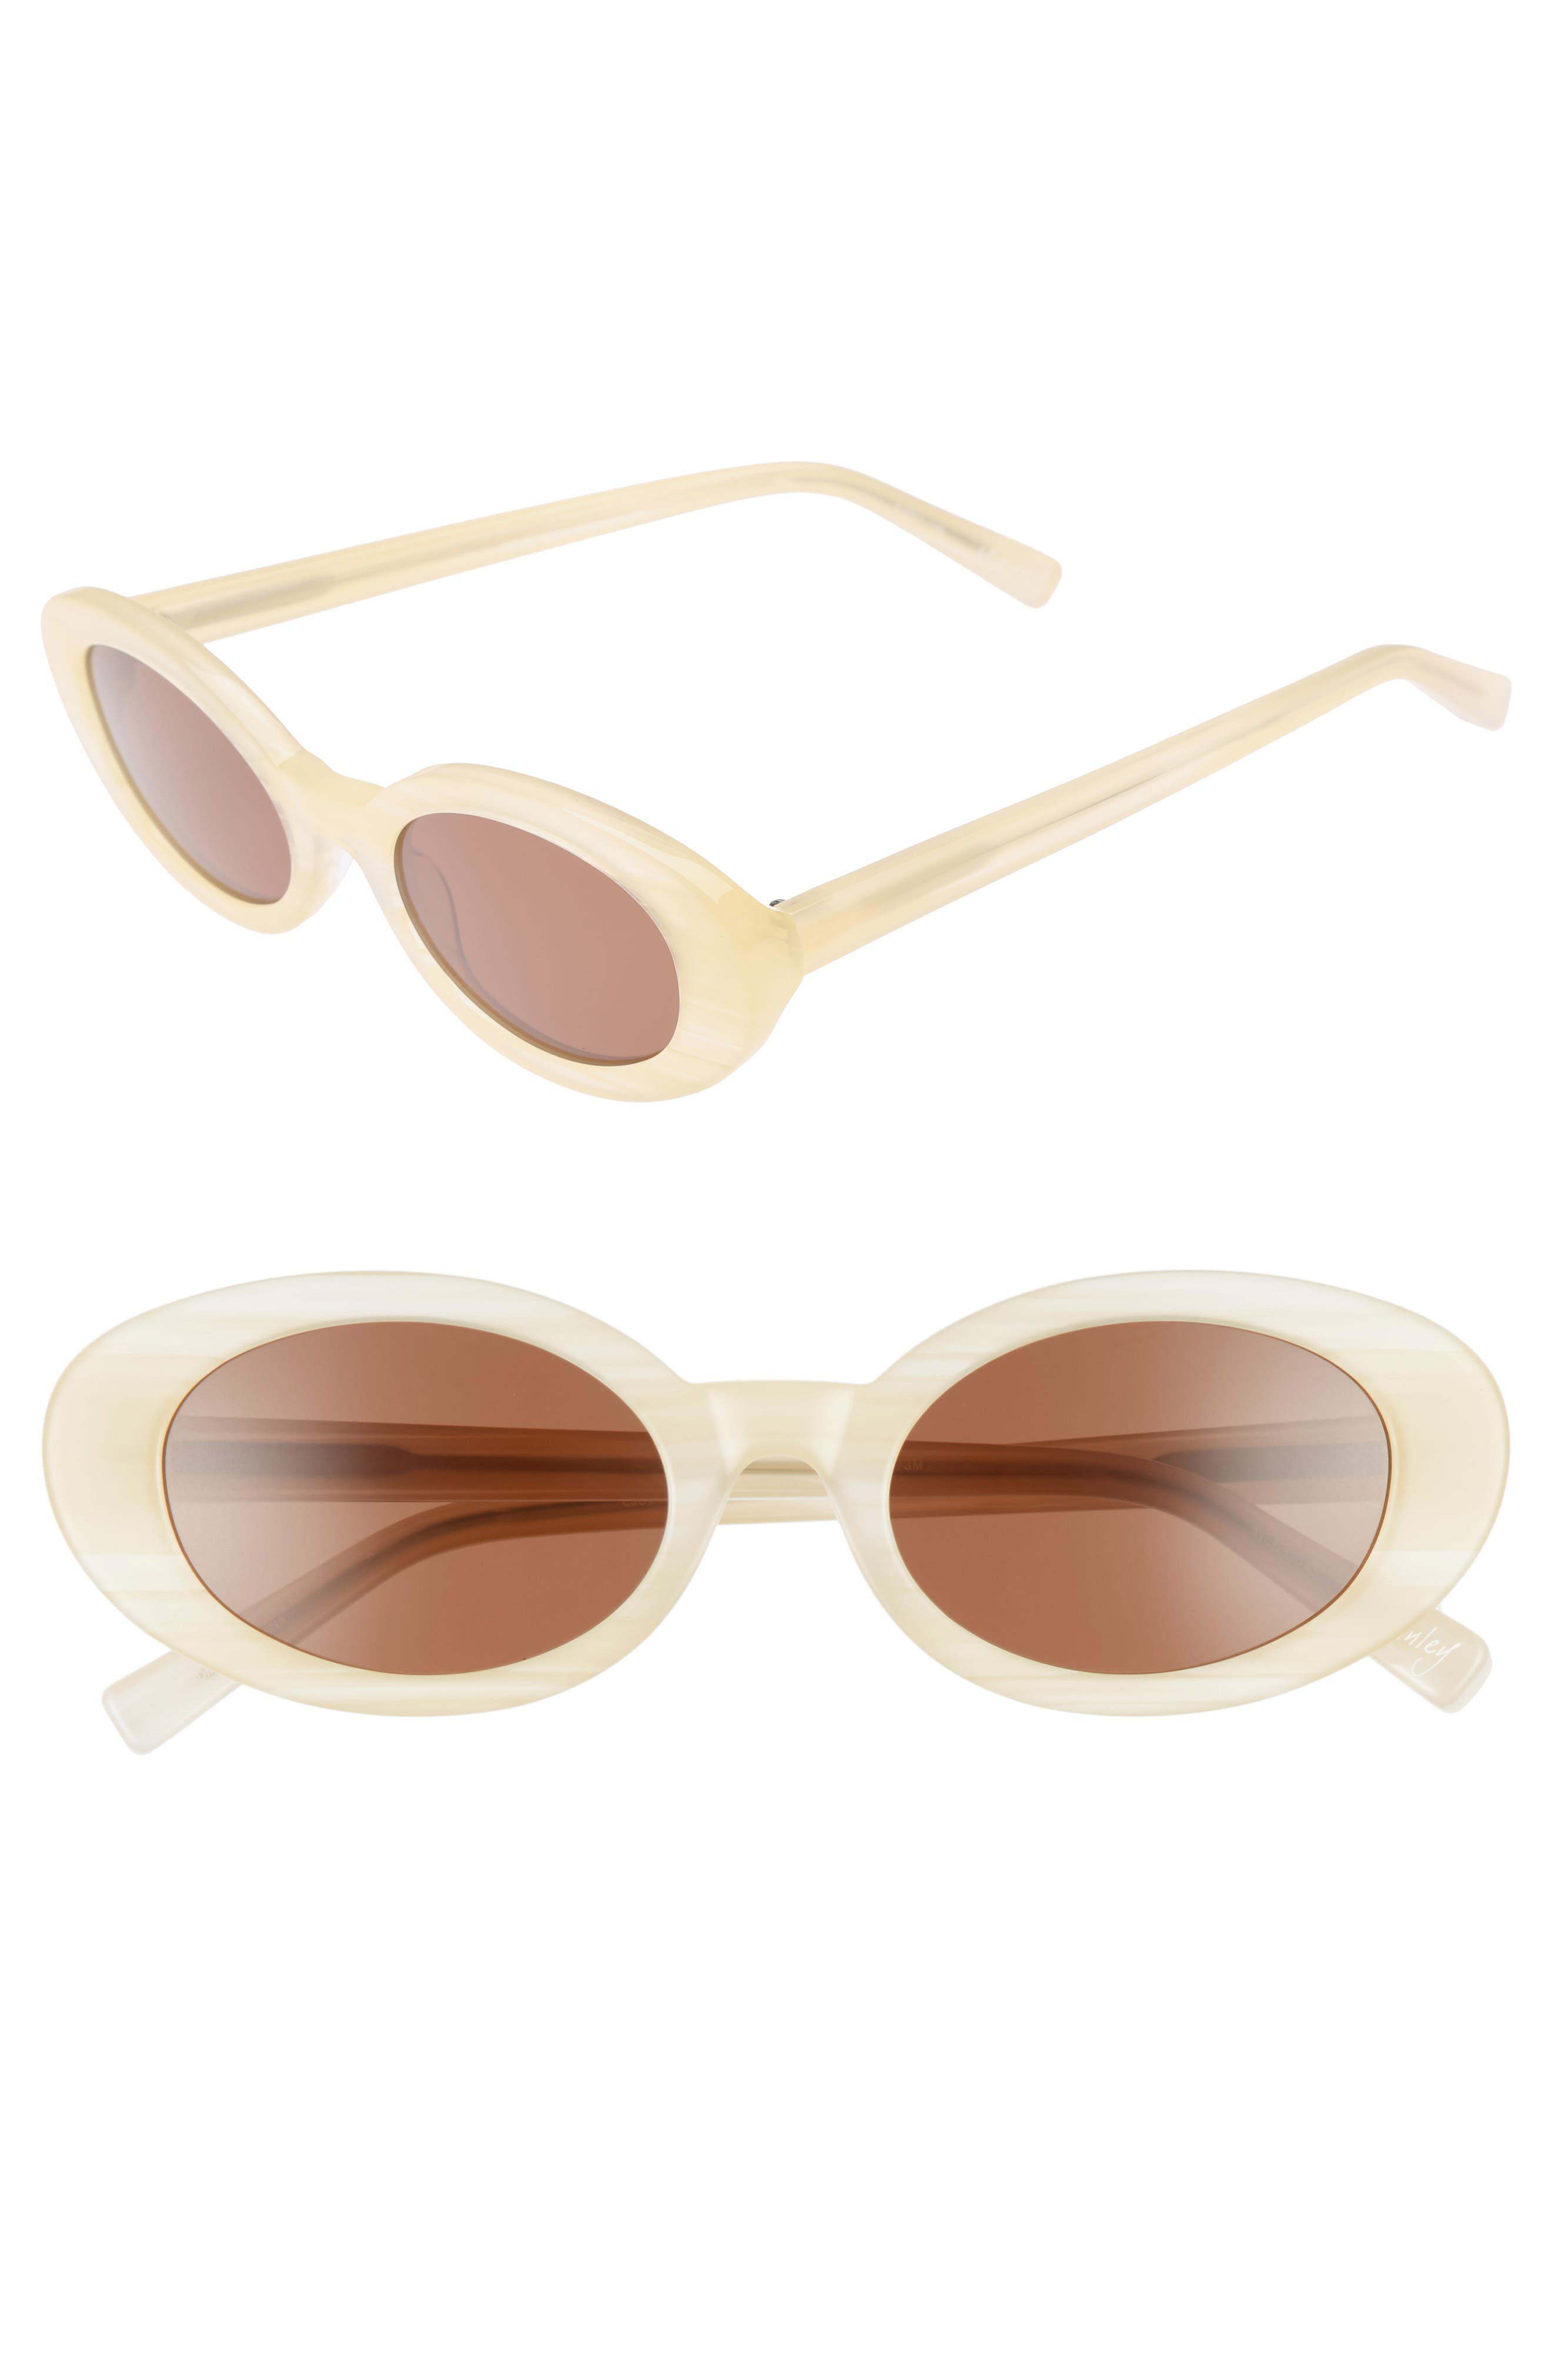 Main Image - Elizabeth and James McKinely 51mm Oval Sunglasses